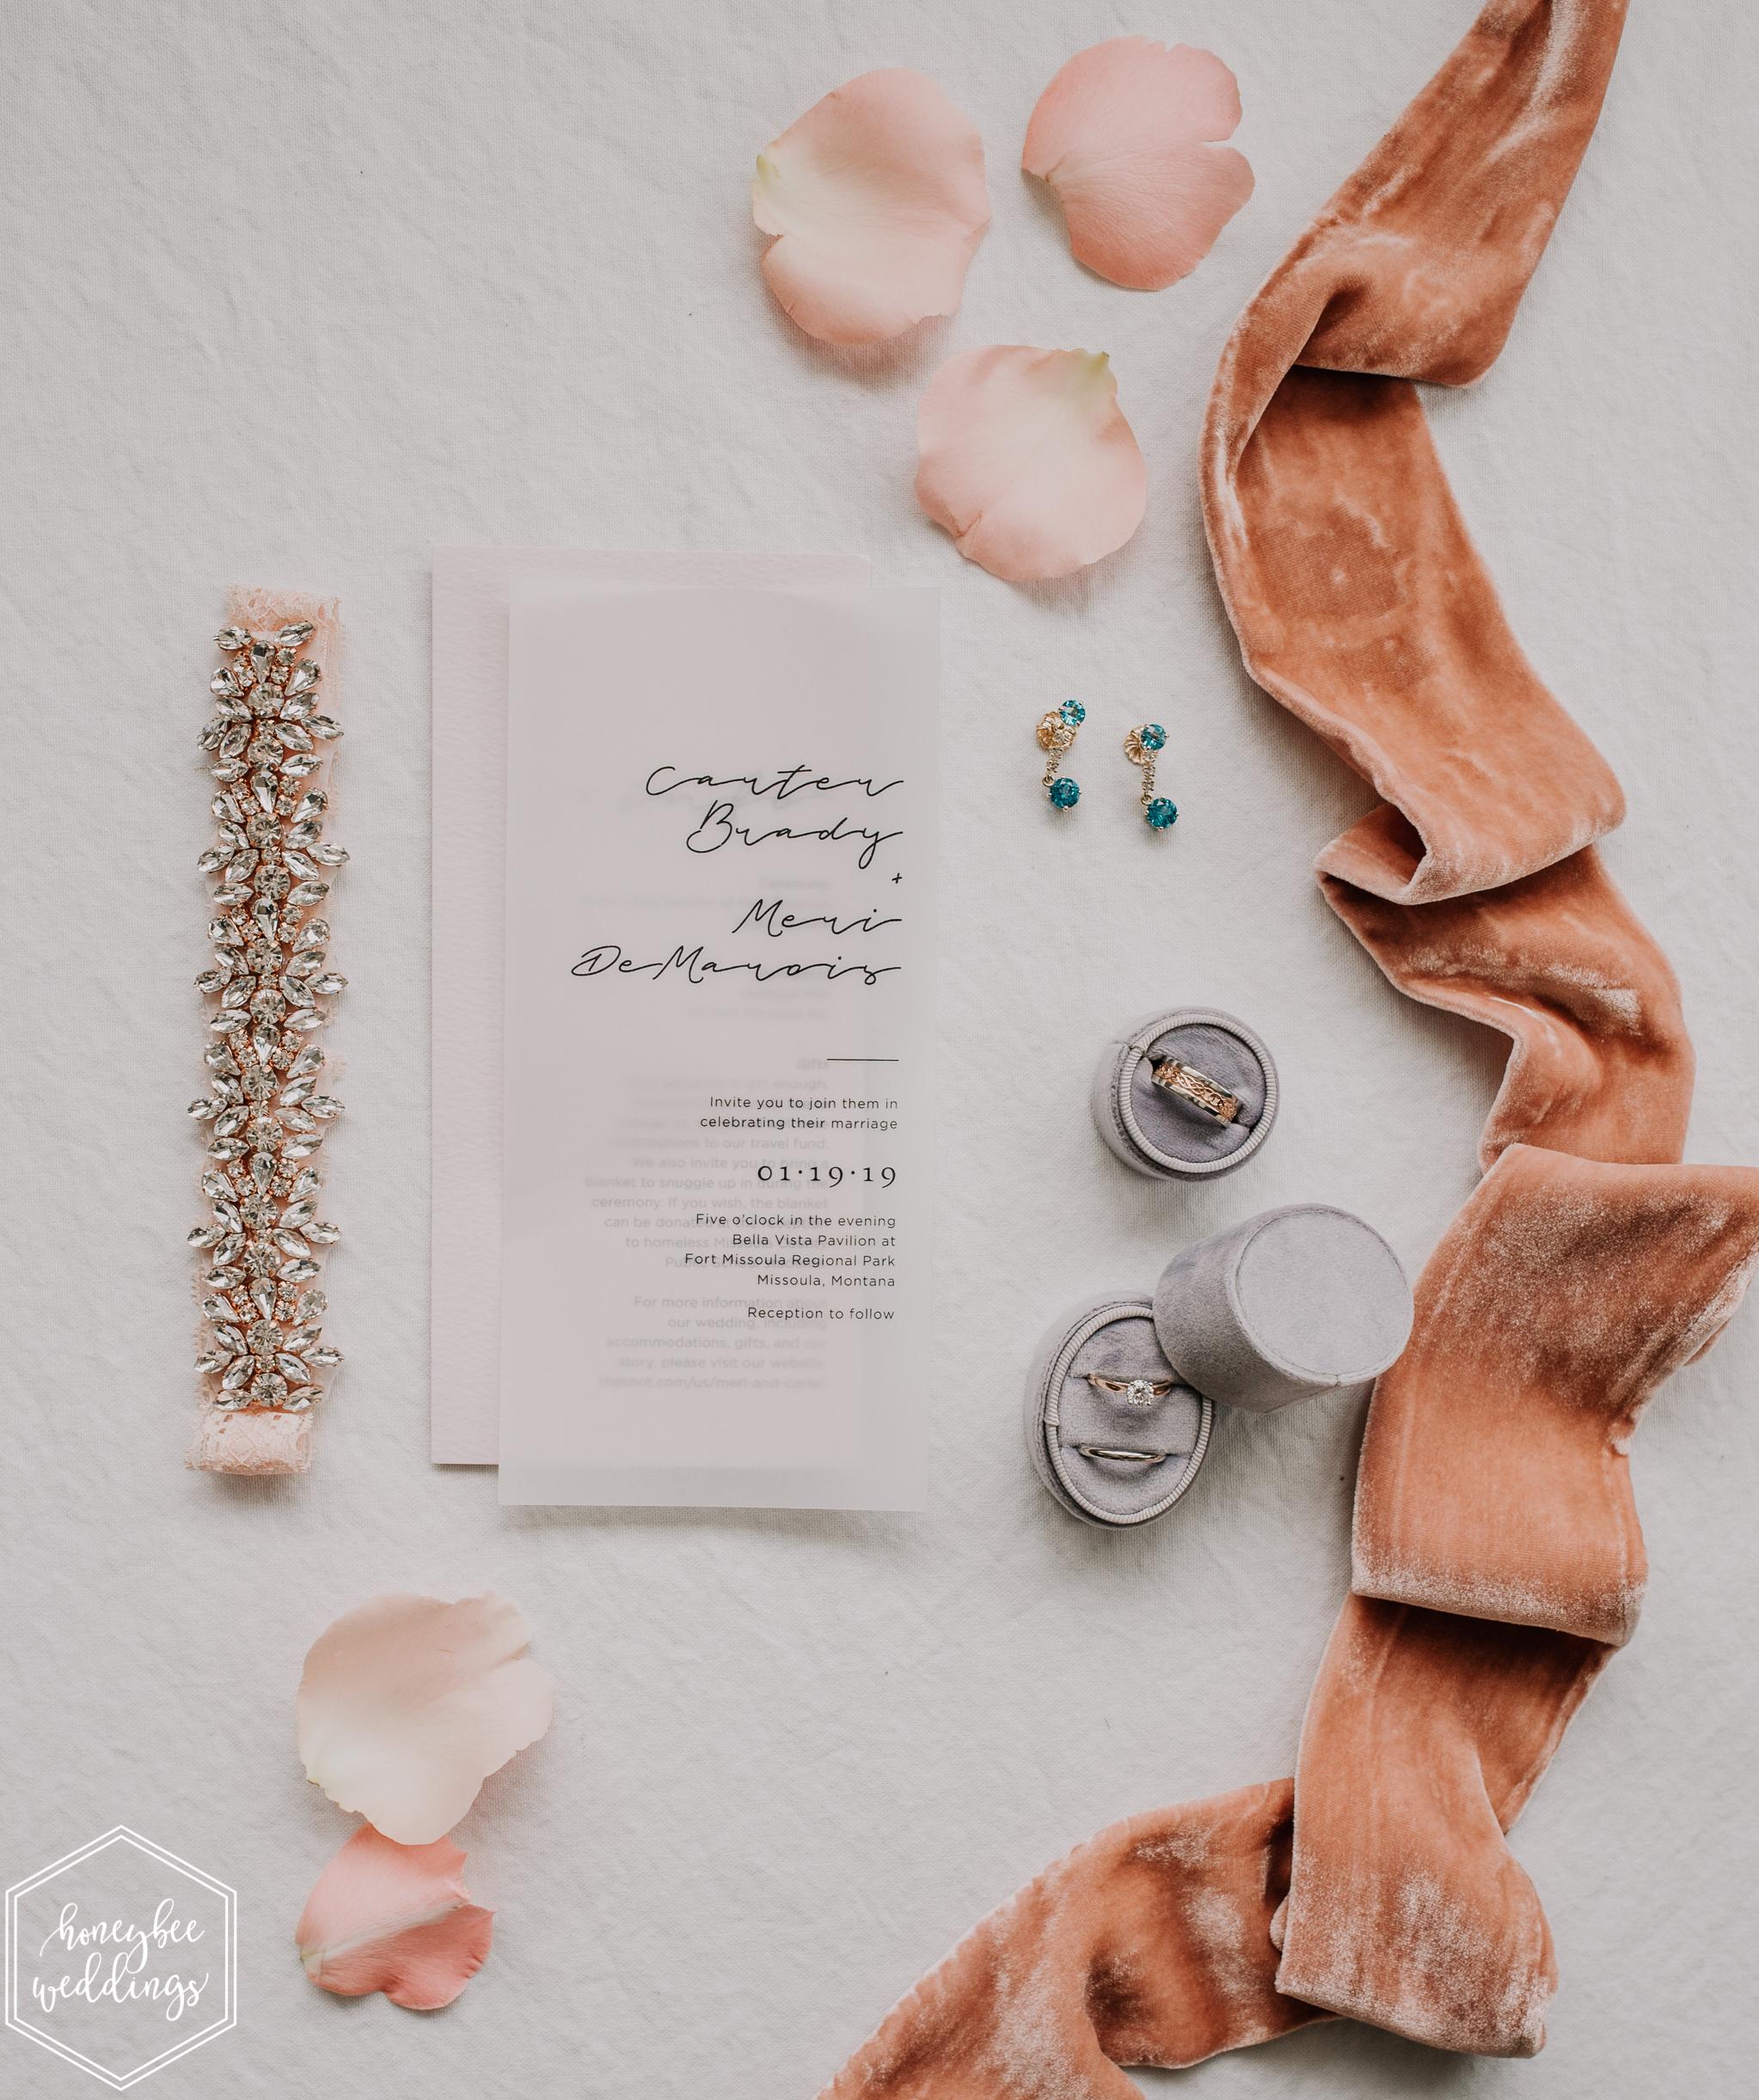 0001Montana Wedding Photographer_Montana winter wedding_Wedding at Fort Missoula_Meri & Carter_January 19, 2018-8.jpg